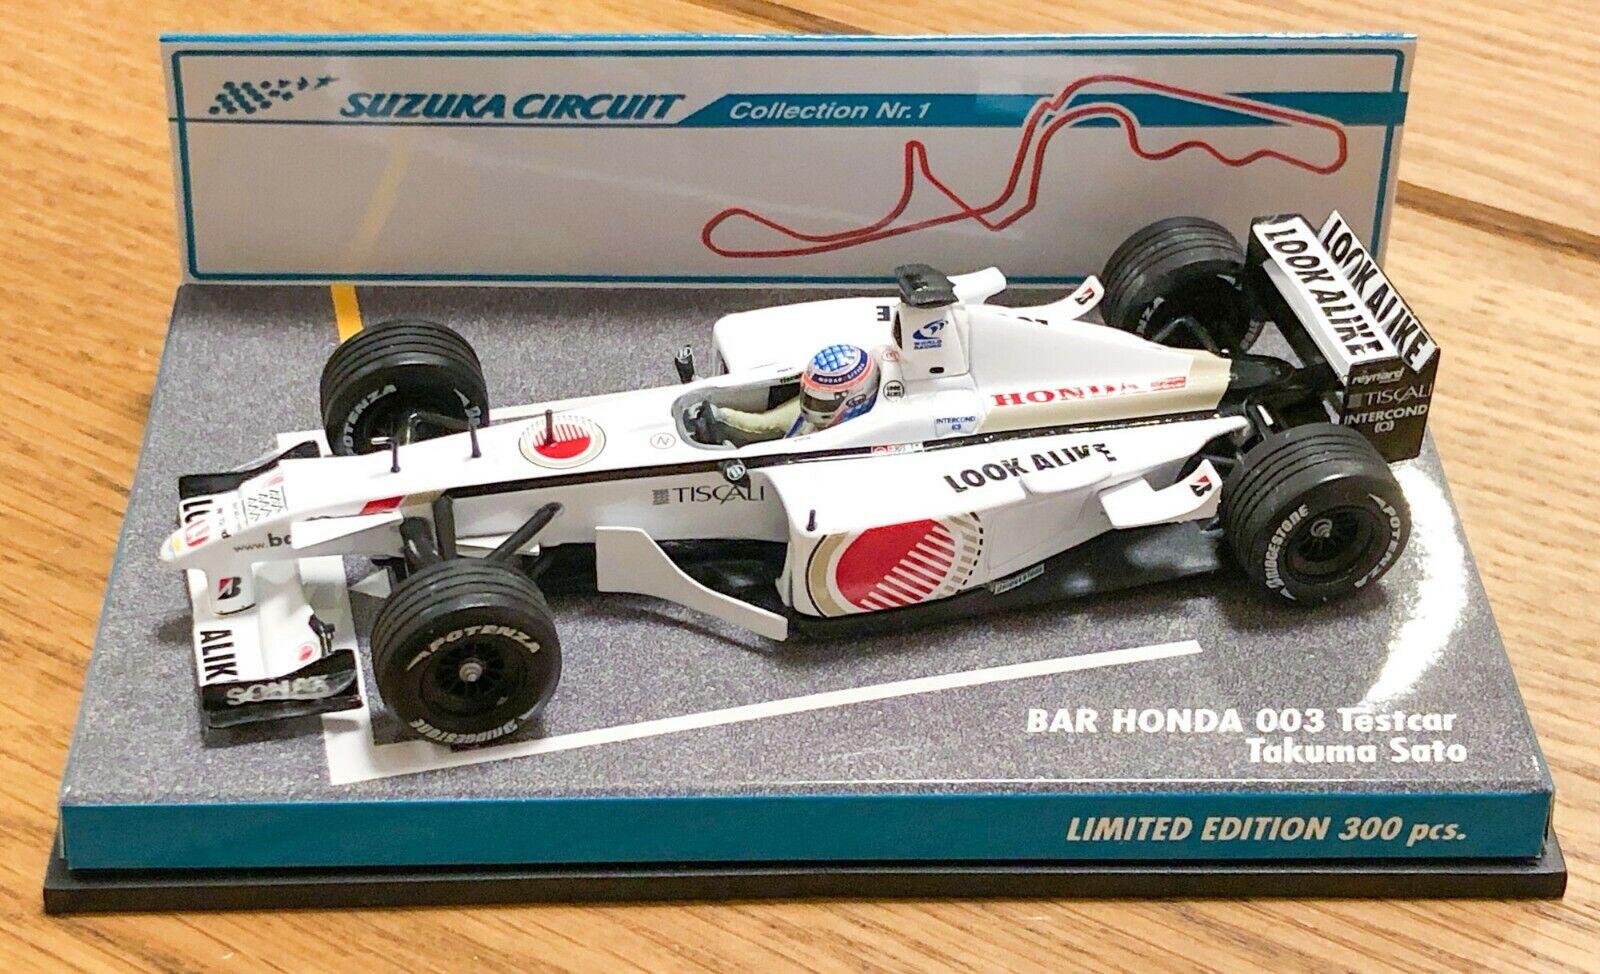 No en venta   Minichamps 1 43 Bar Honda 003 Testcar Takuma Sato F1 2001 Suzuka